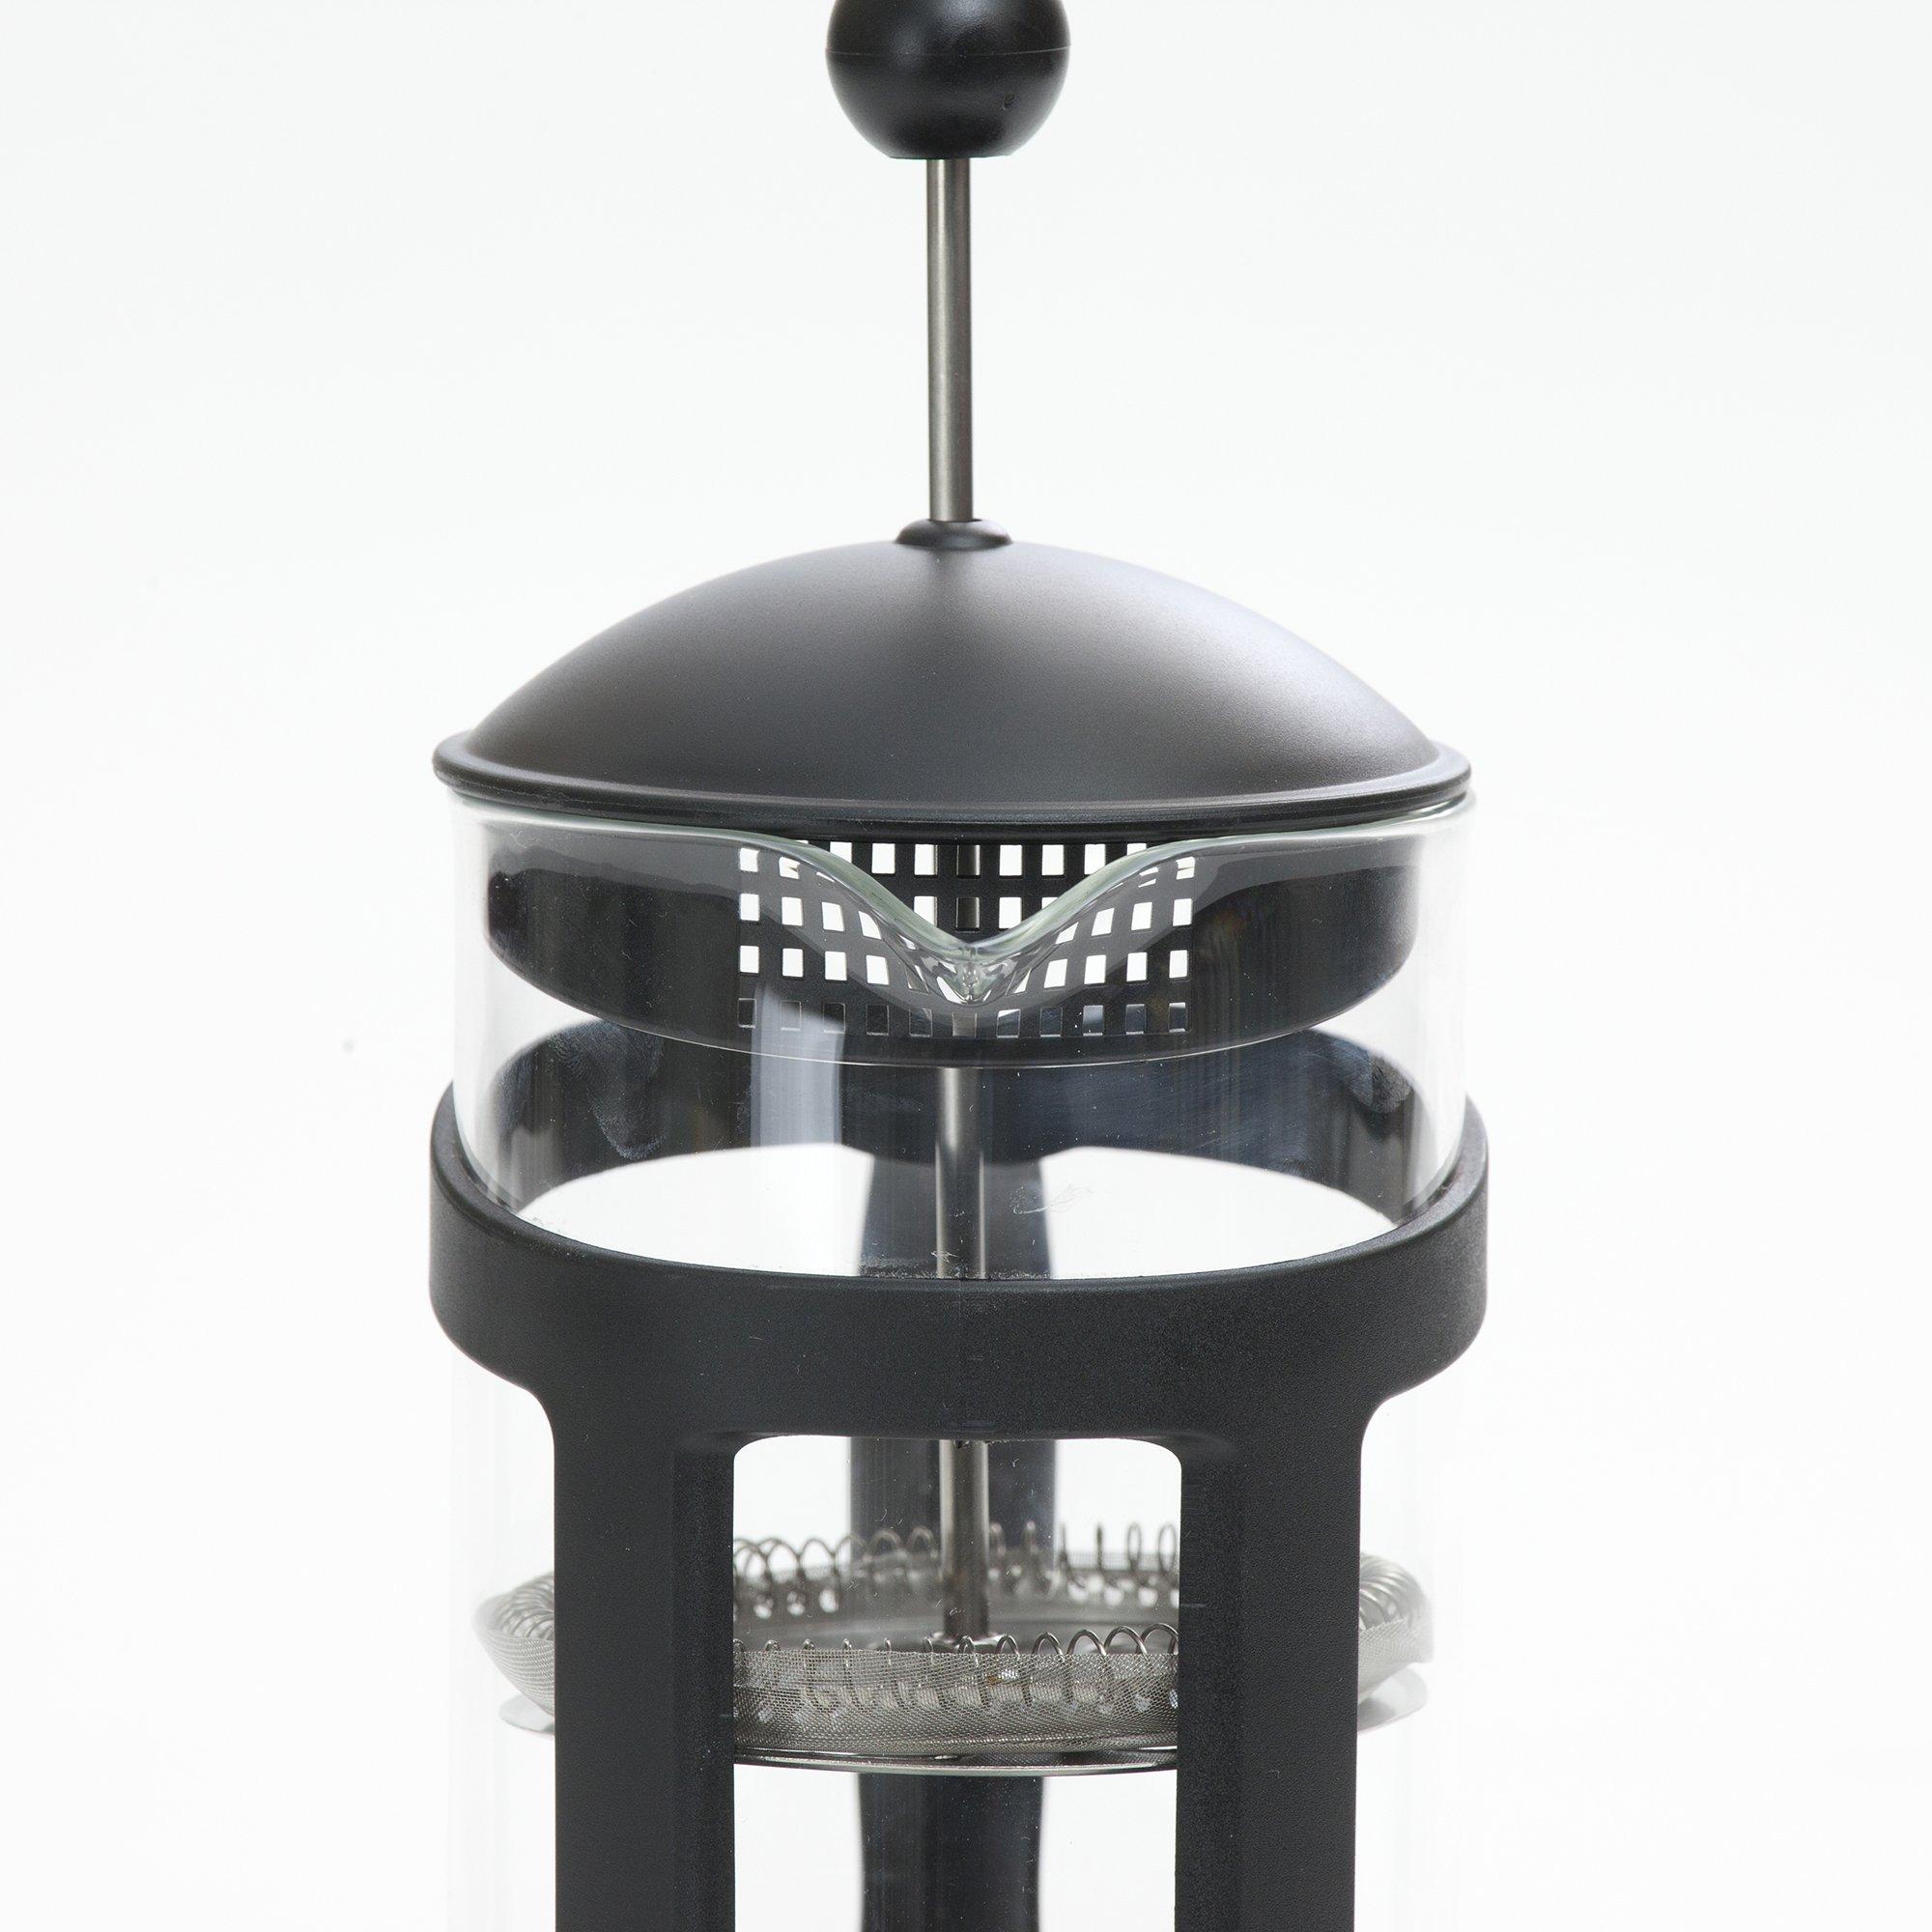 Mind Reader French Press Coffee & Tea Maker 27 oz, Glass by Mind Reader (Image #1)